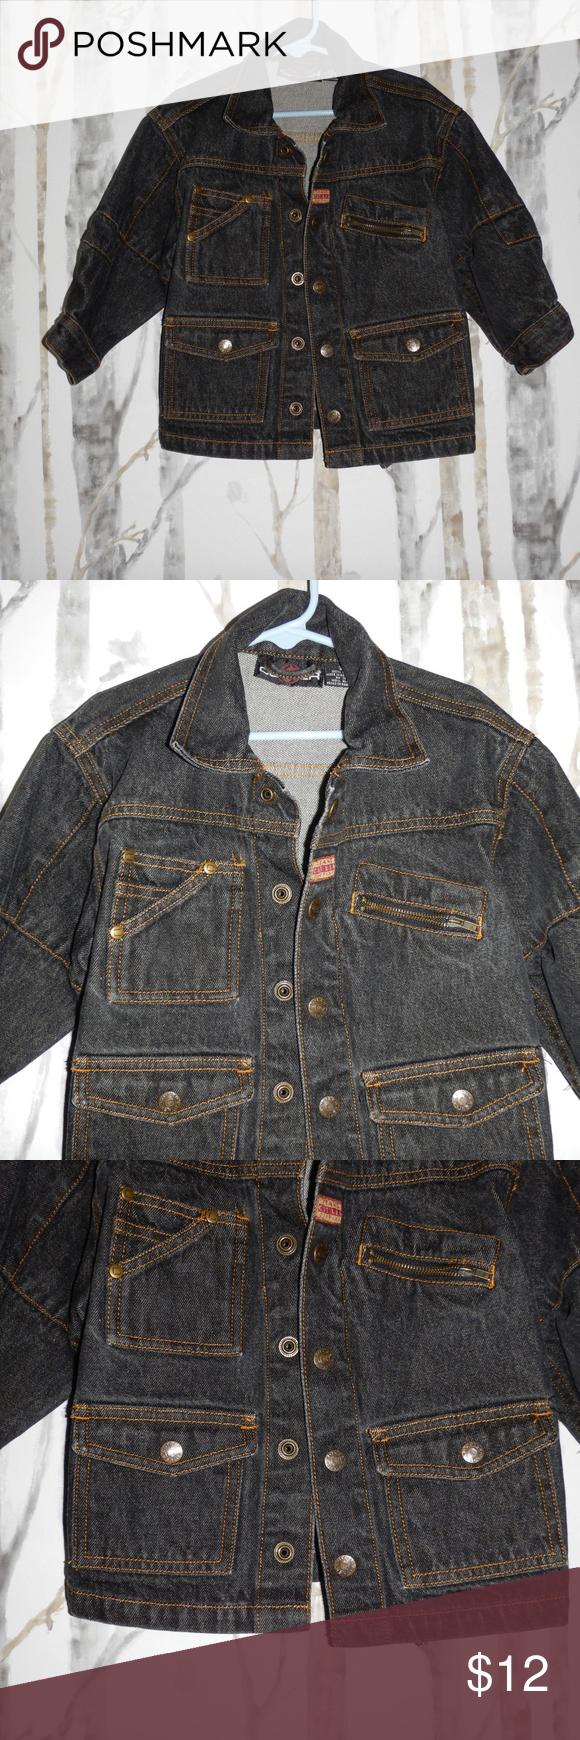 Cotler Boys Denim Jacket Cotler Boys Black Denim Jean Jacket Size 3t